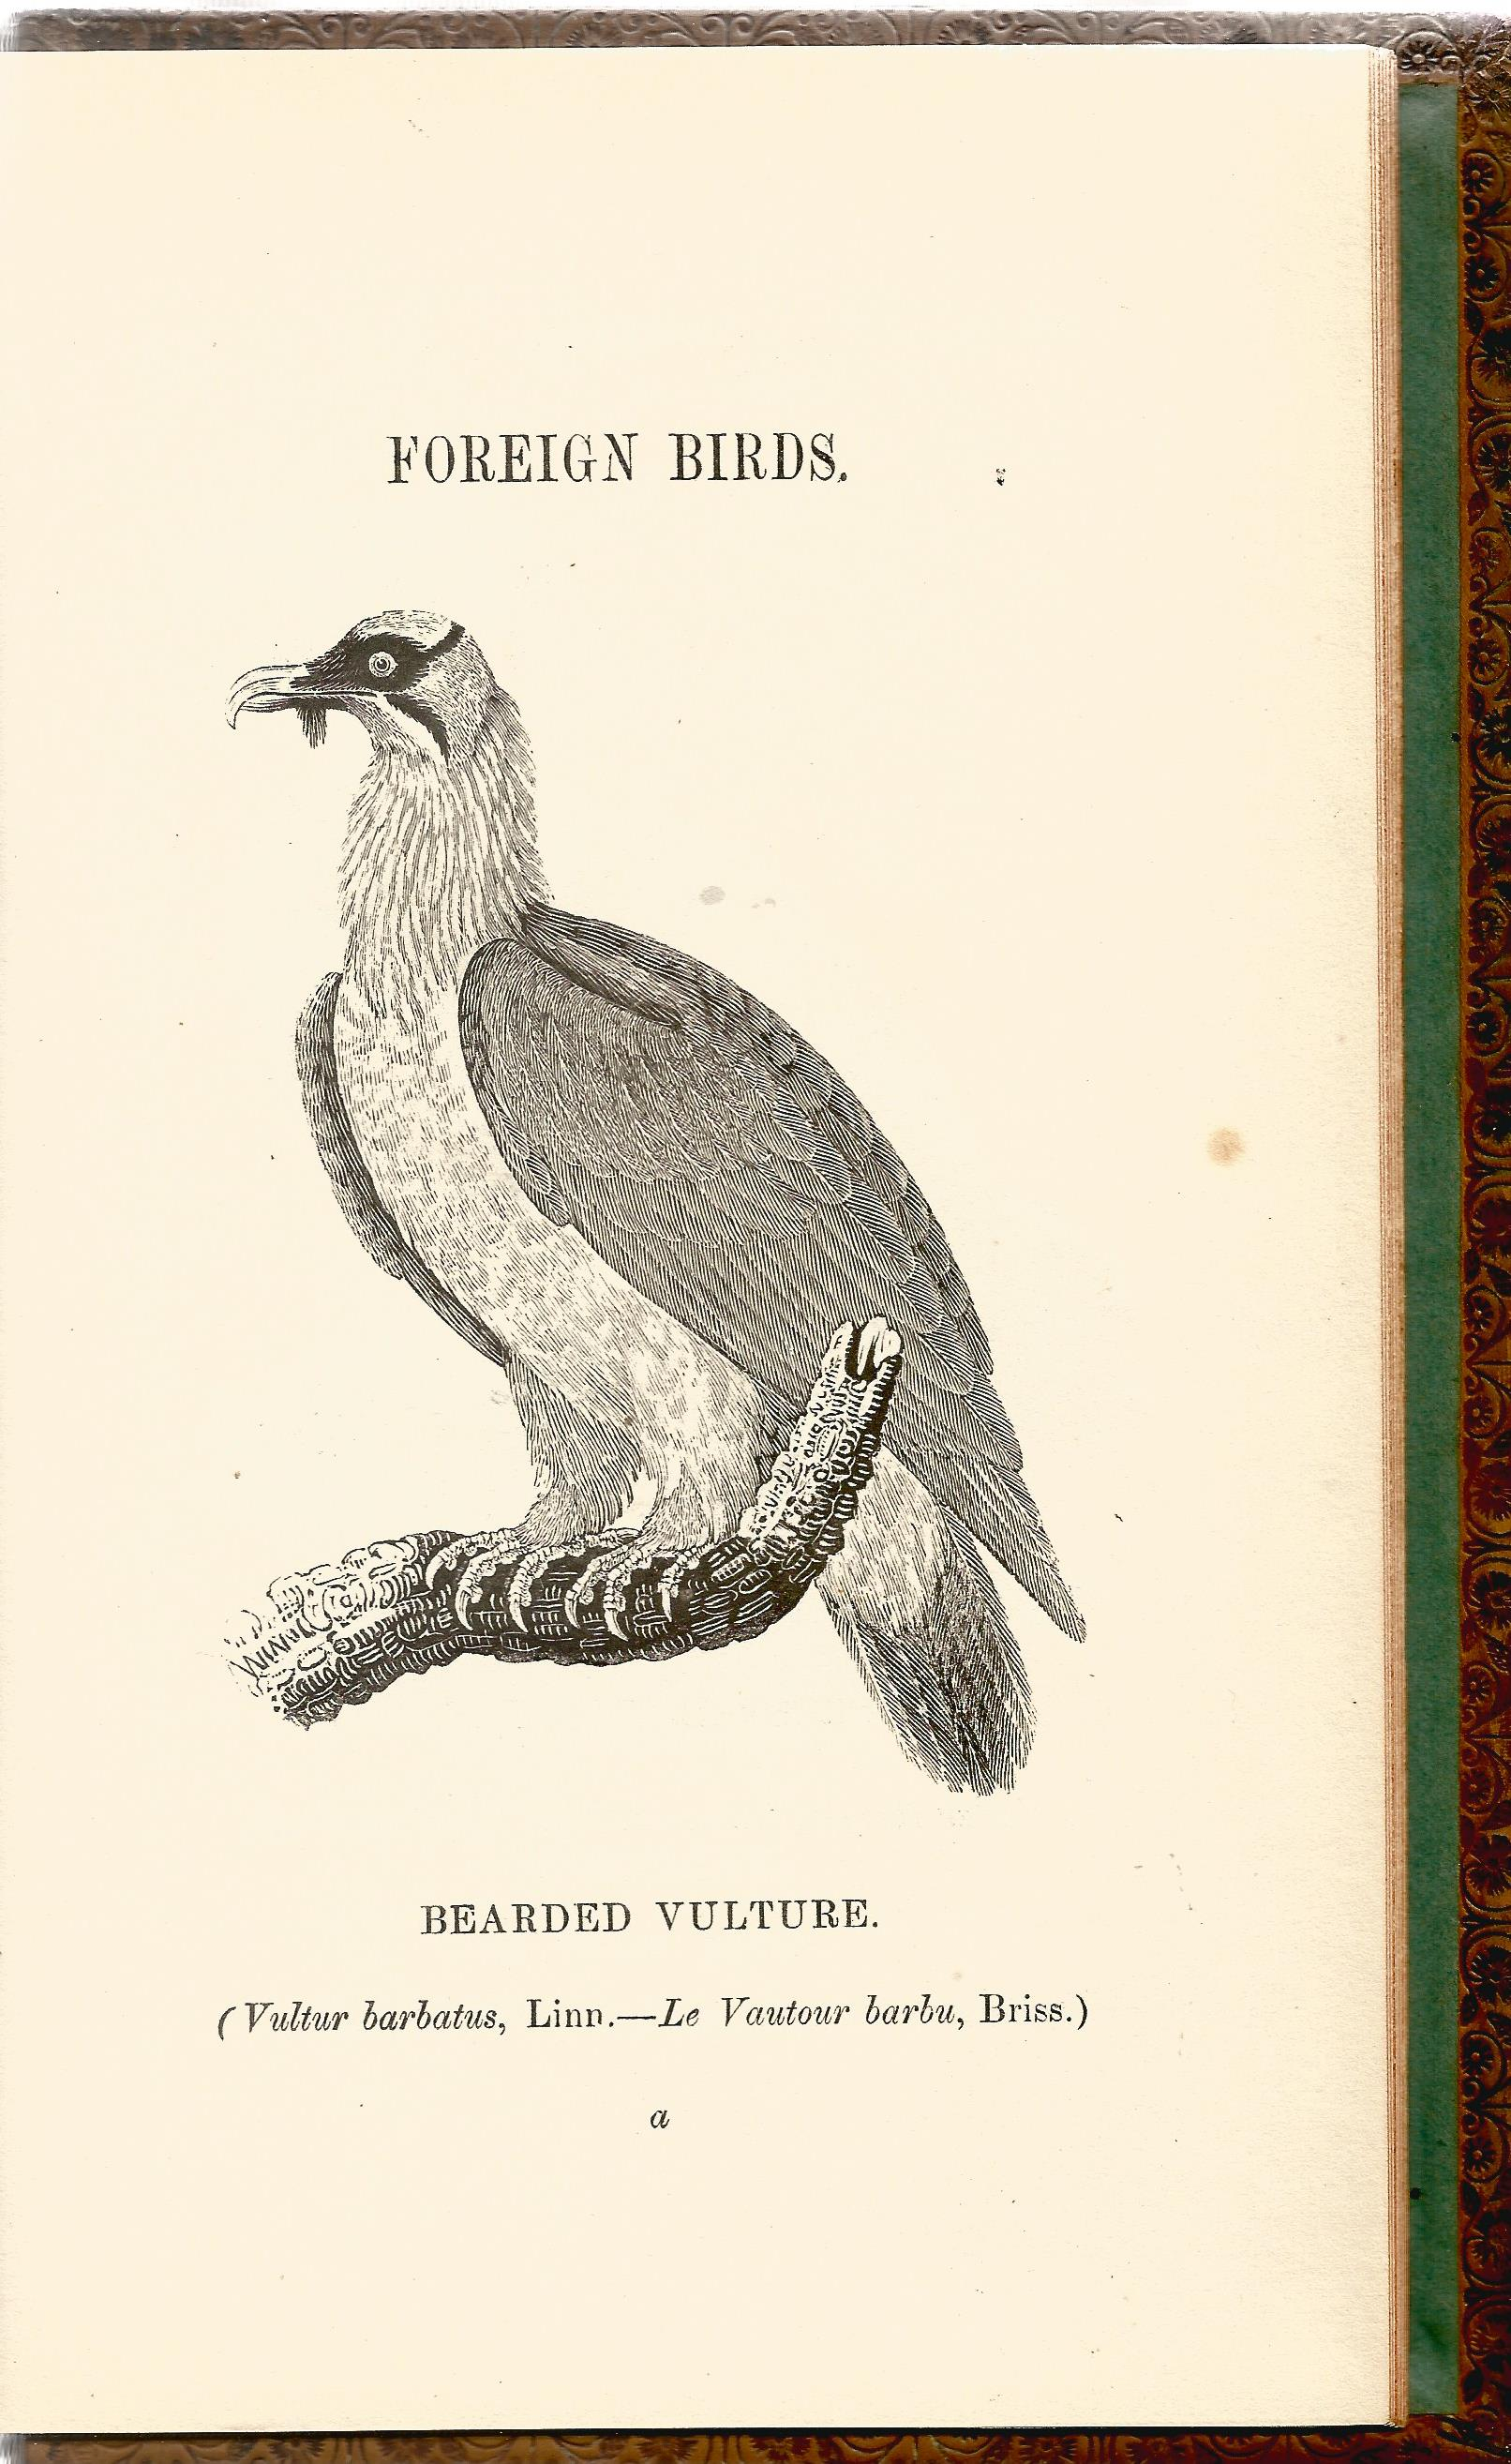 2 Hardback Books Bewick Birds A History of British Birds by Thomas Bewick 1847 Full Leather Bindings - Image 3 of 5